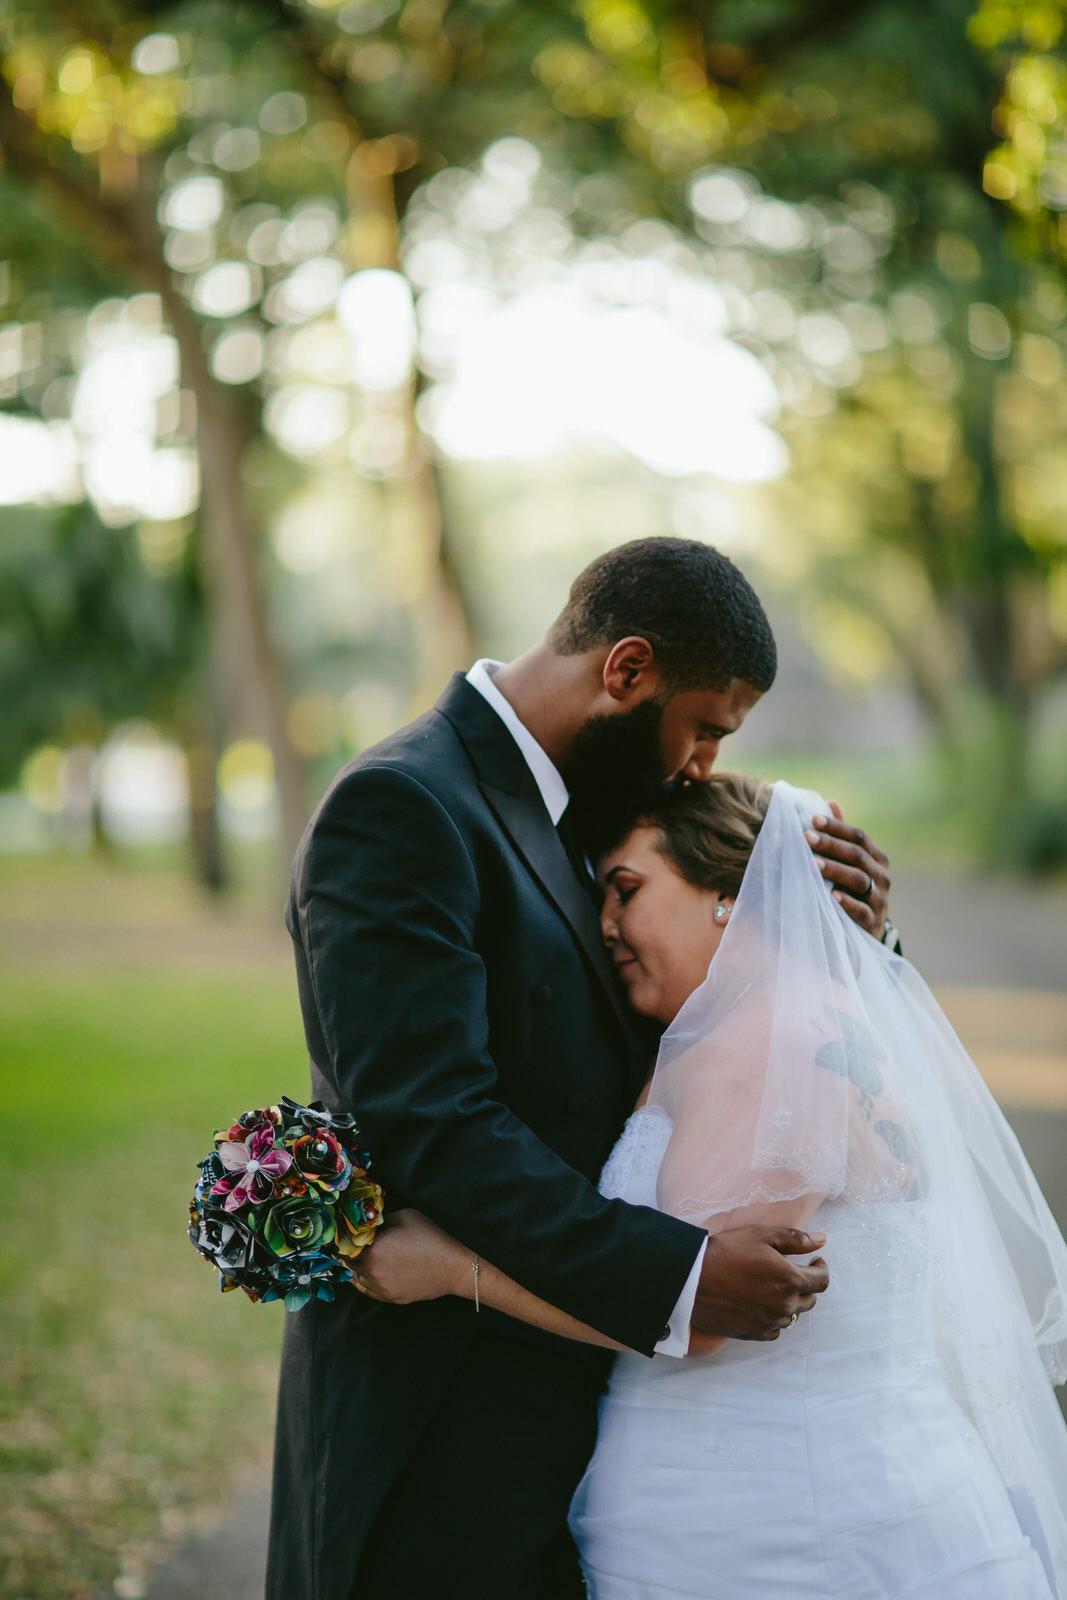 bride-and-groom-emotional-moments-tiny-house-photo-documentary-wedding-photography.jpg